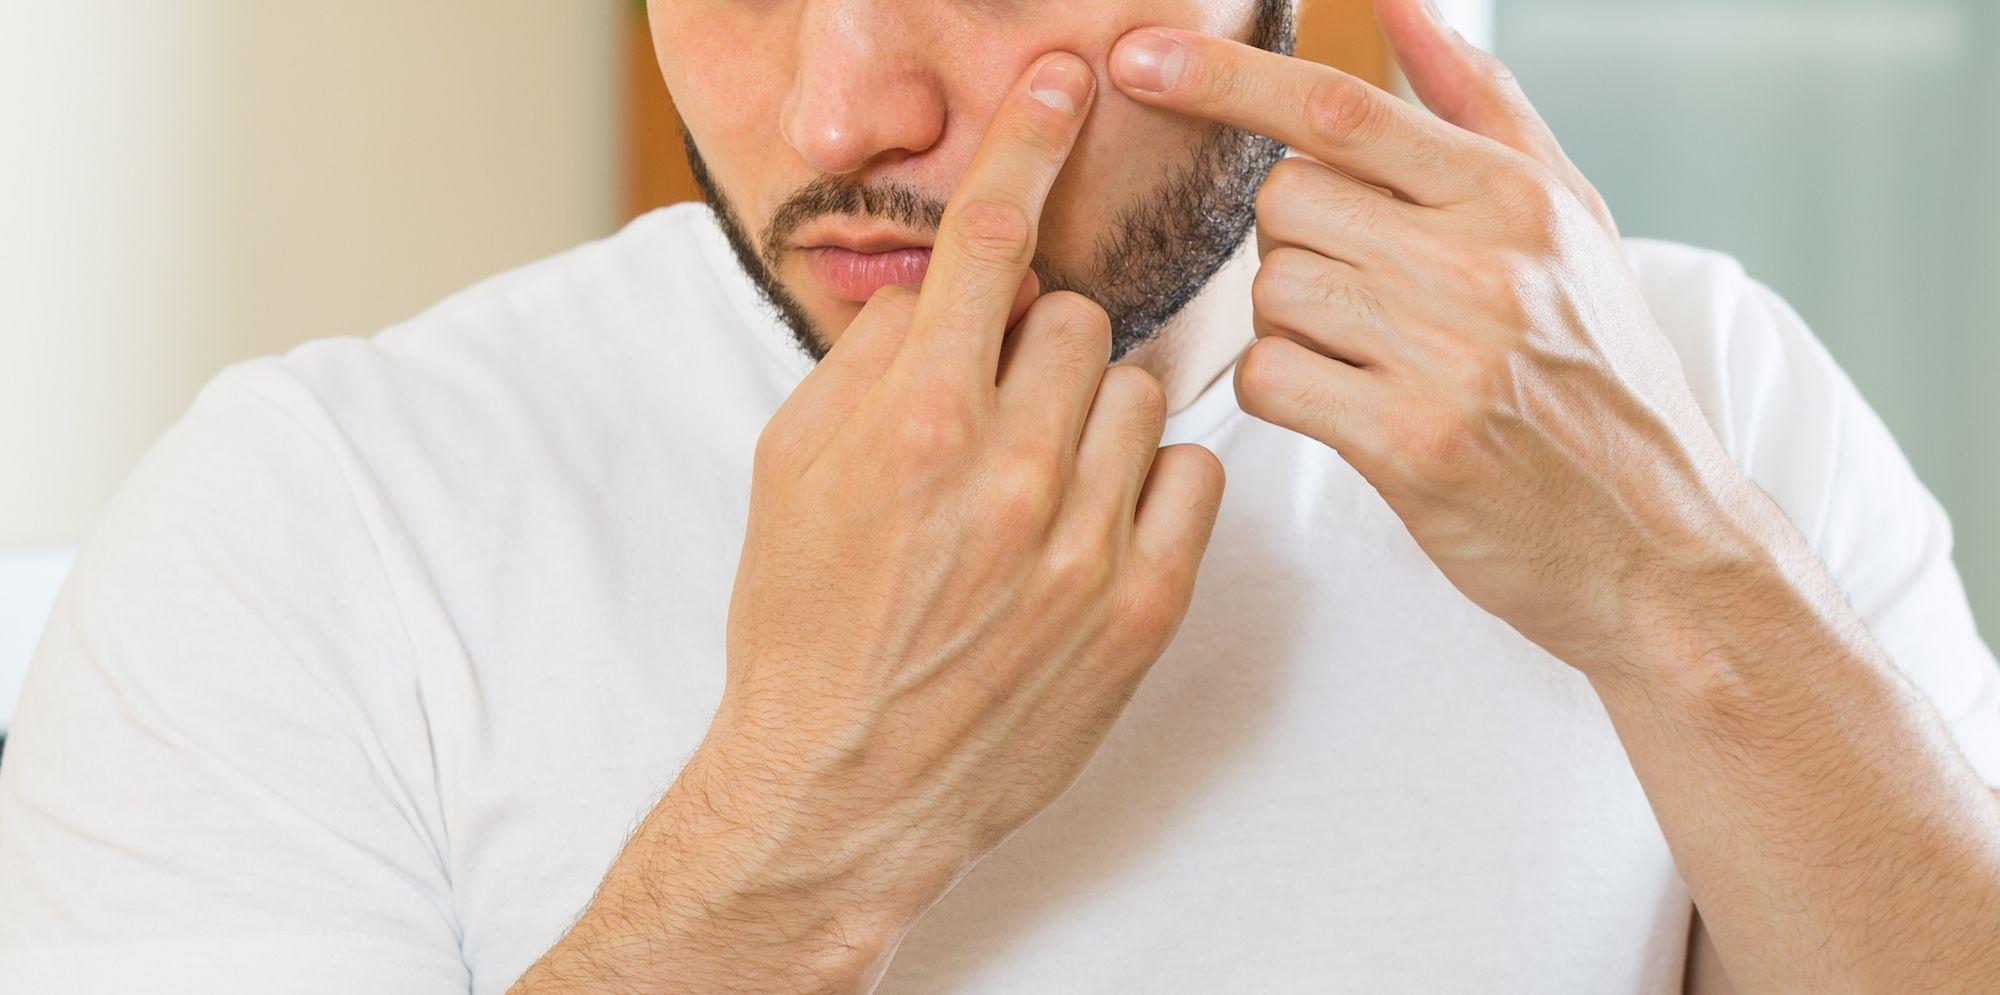 This Neck Pimple Packs a Big Pop